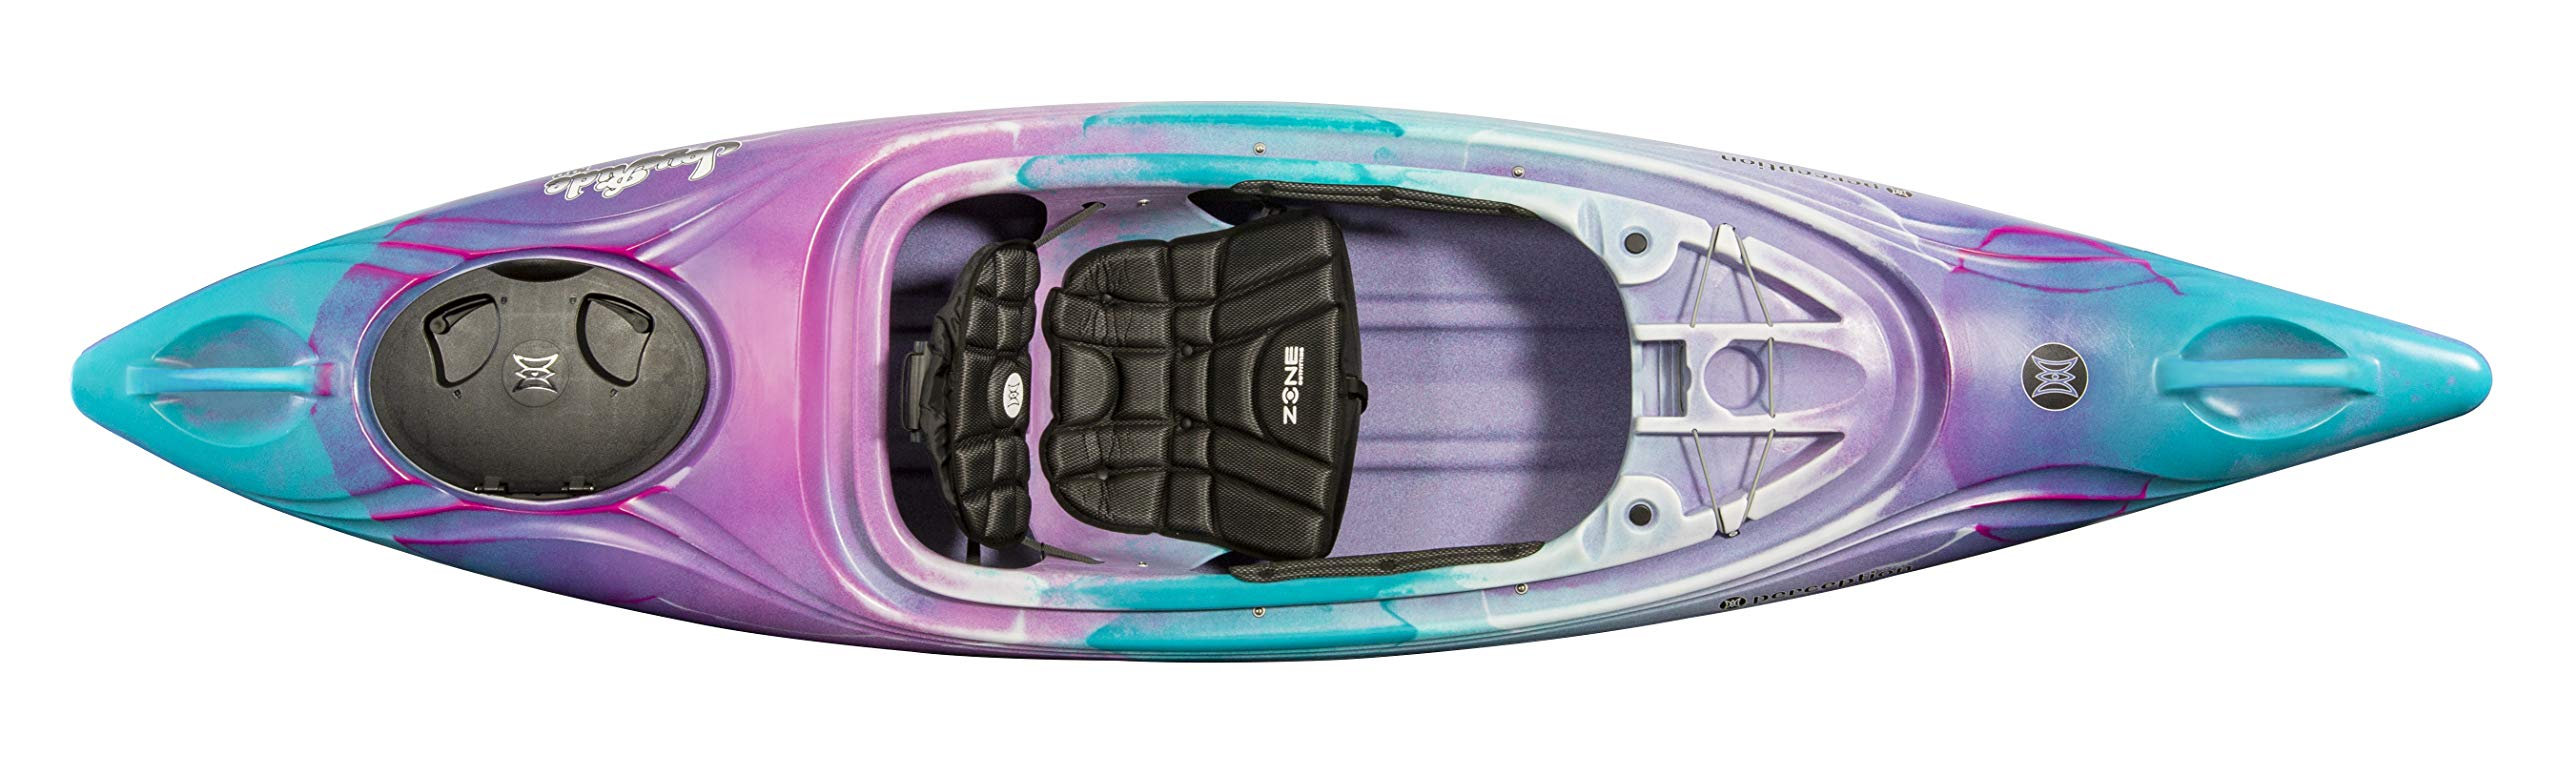 Perception Joyride 10 | Sit Inside Kayak for Adults and Kids | Recreational and Multi-Water Kayak with Selfie Slot | 10' | Funkadelic by Perception Kayaks